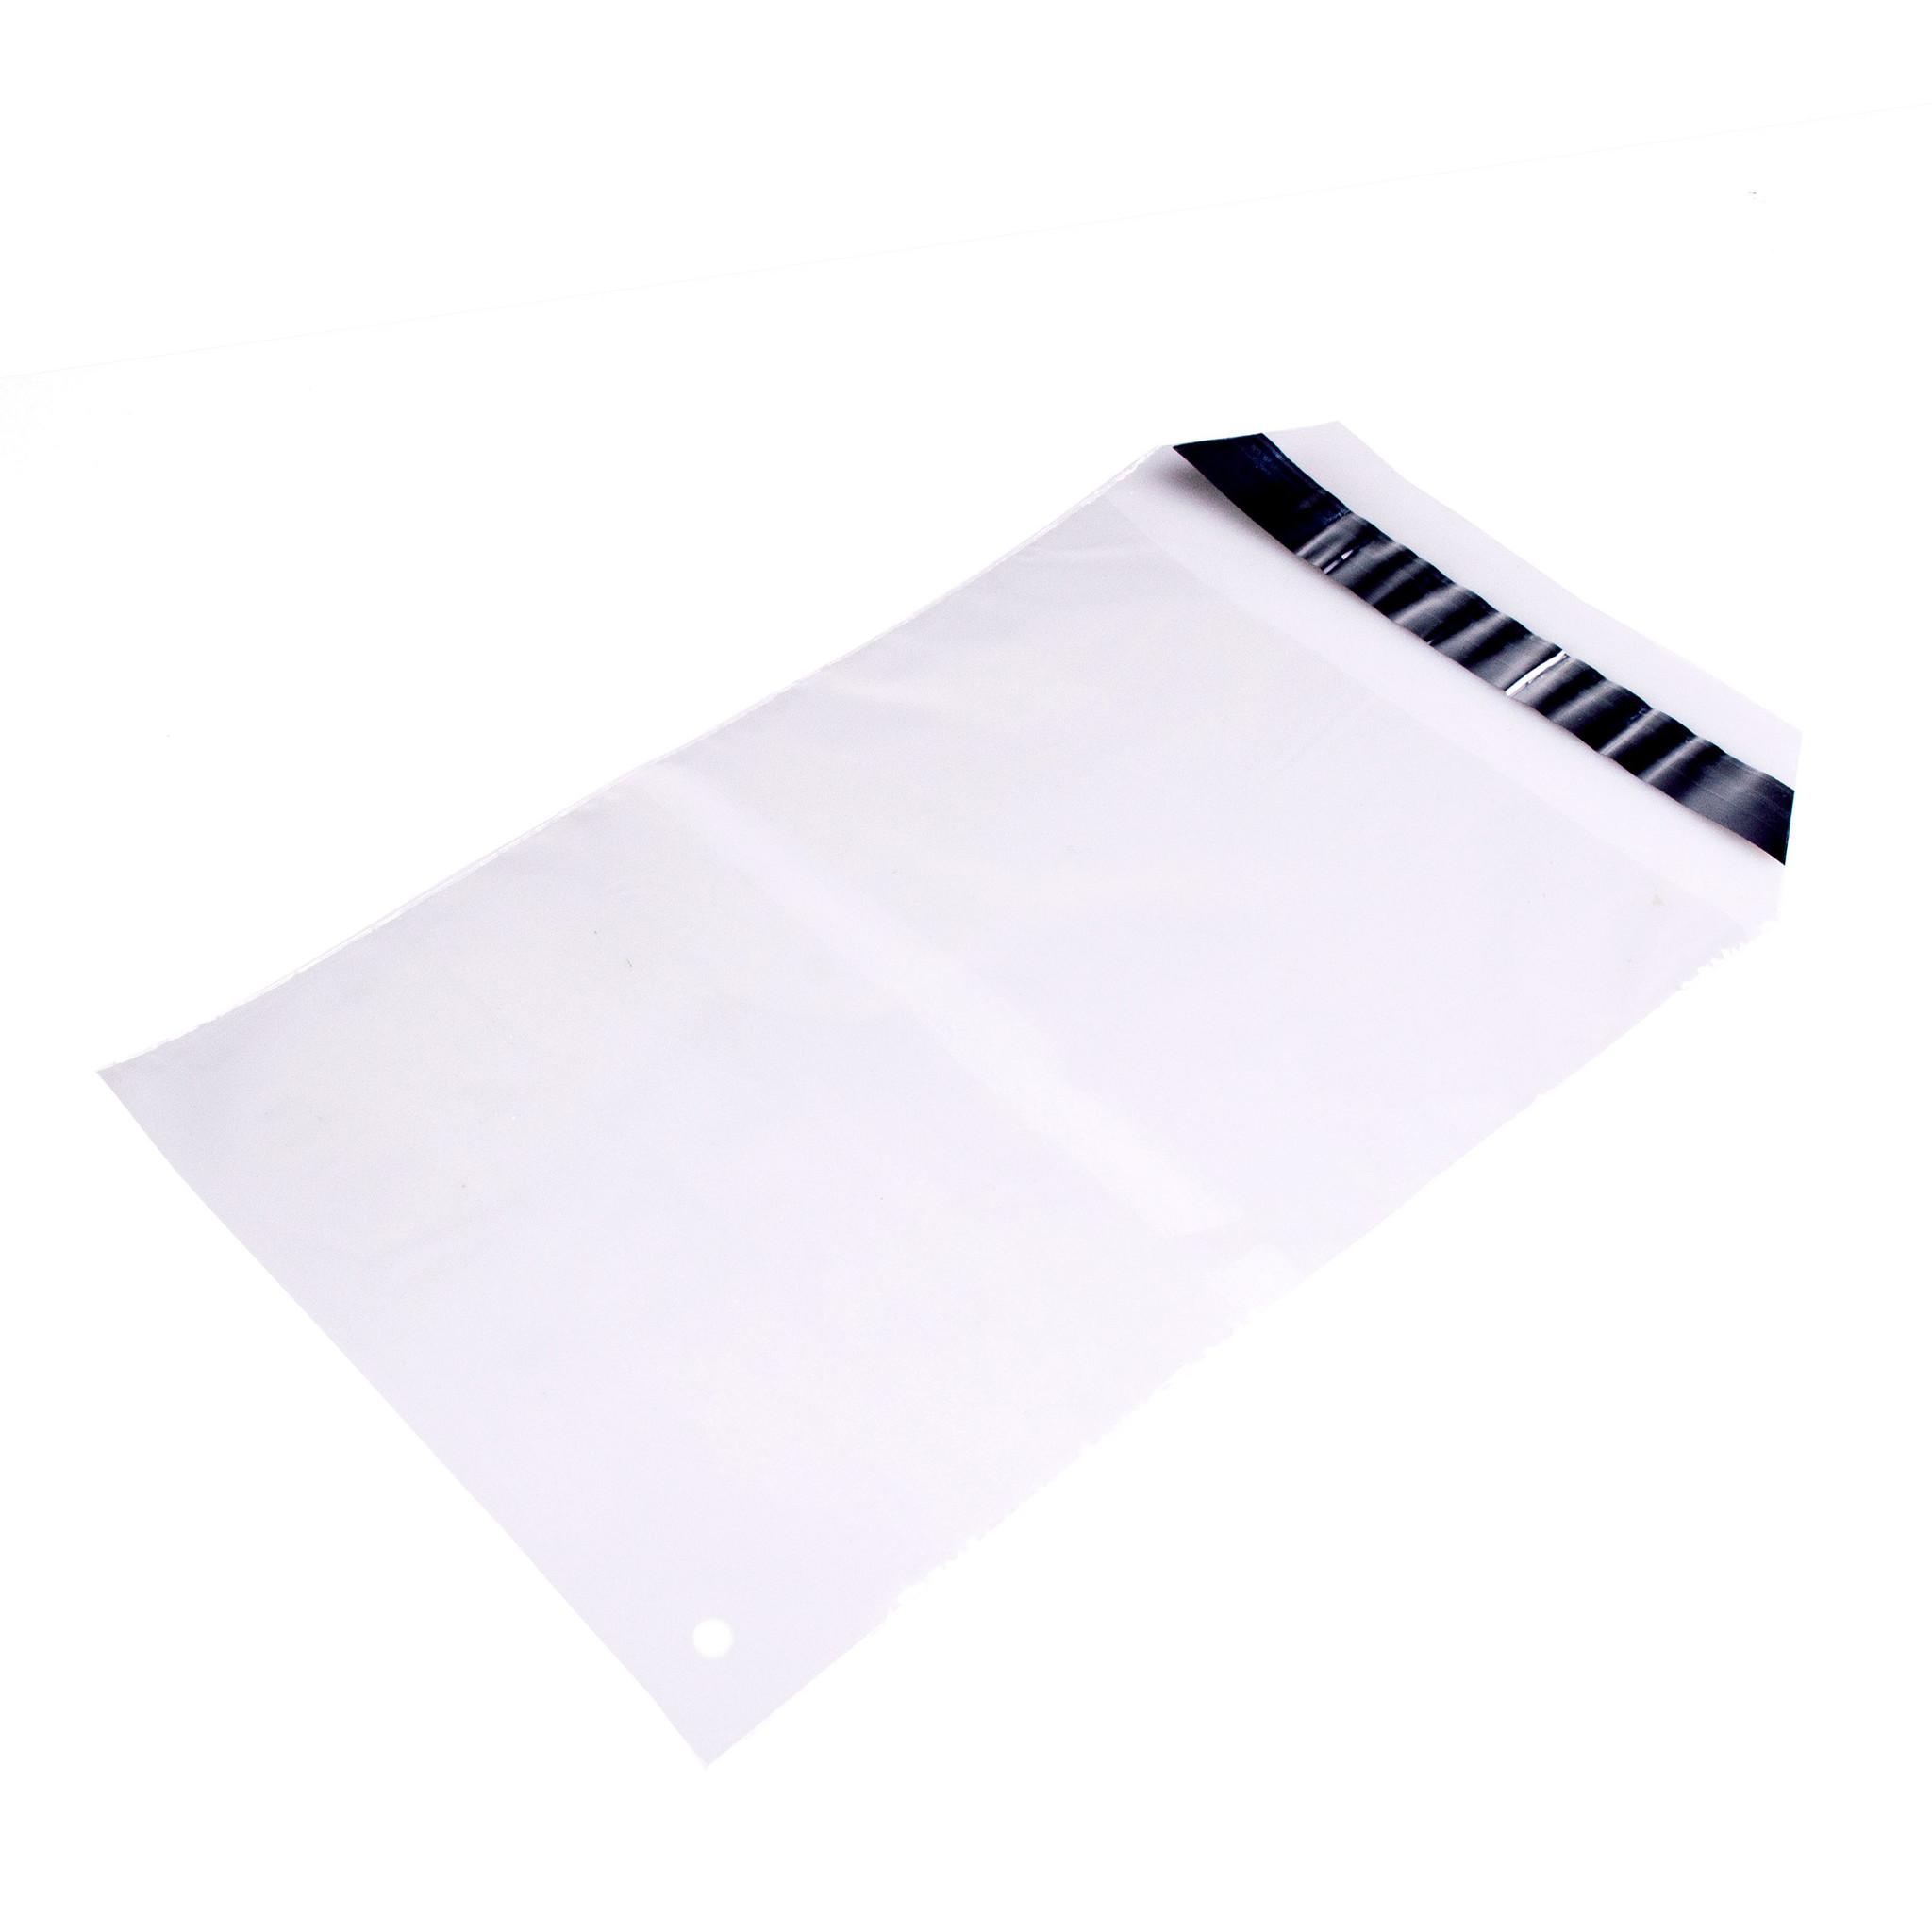 Mailing envelop 165 x 220 + 50 mm uit 45 micron LDPE pakje van 100 stuks